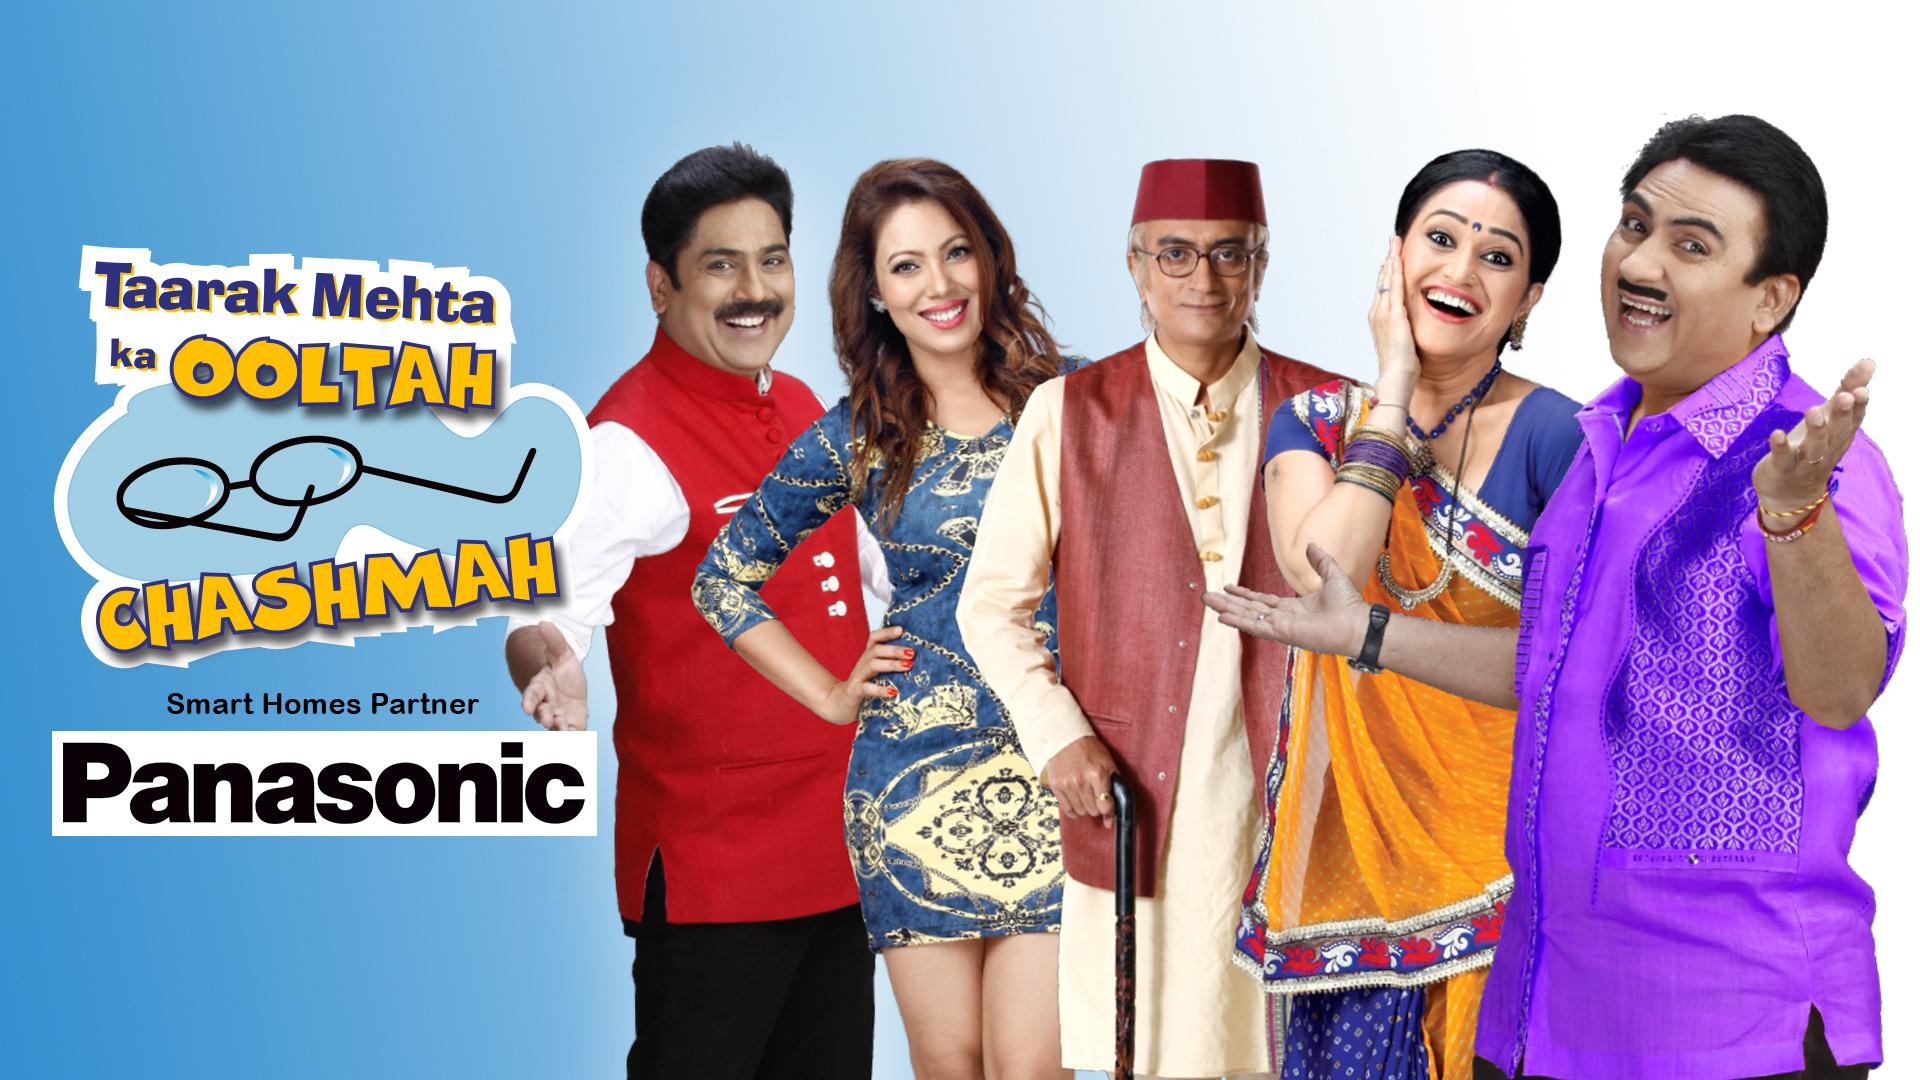 Watch Taarak Mehta Ka Ooltah Chashmah Online - All Latest Episodes Online on SonyLIV